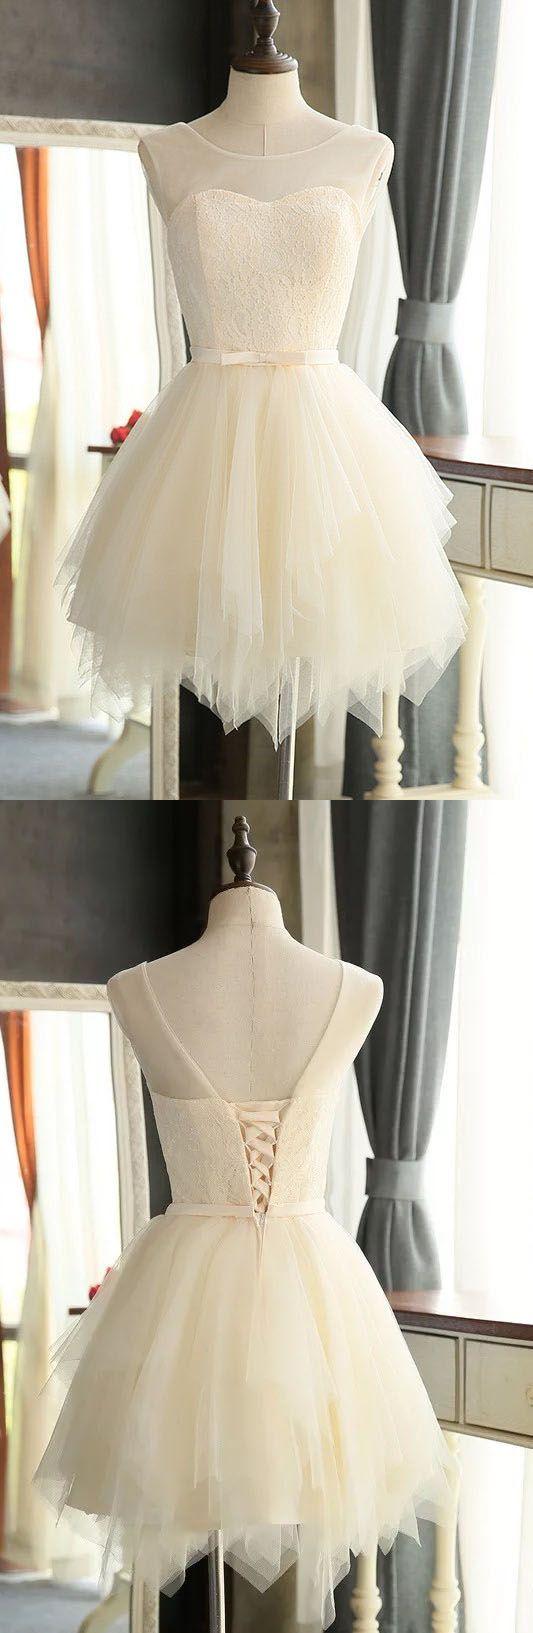 Simple Homecoming Dress,Short Prom Dress,Girls Cocktail Dresses,Homecoming Dresses,Graduation Dresses,Party Dresses,Short Homecoming Dresses,Ivory Homecoming Dress,Lace Homecoming Dresses